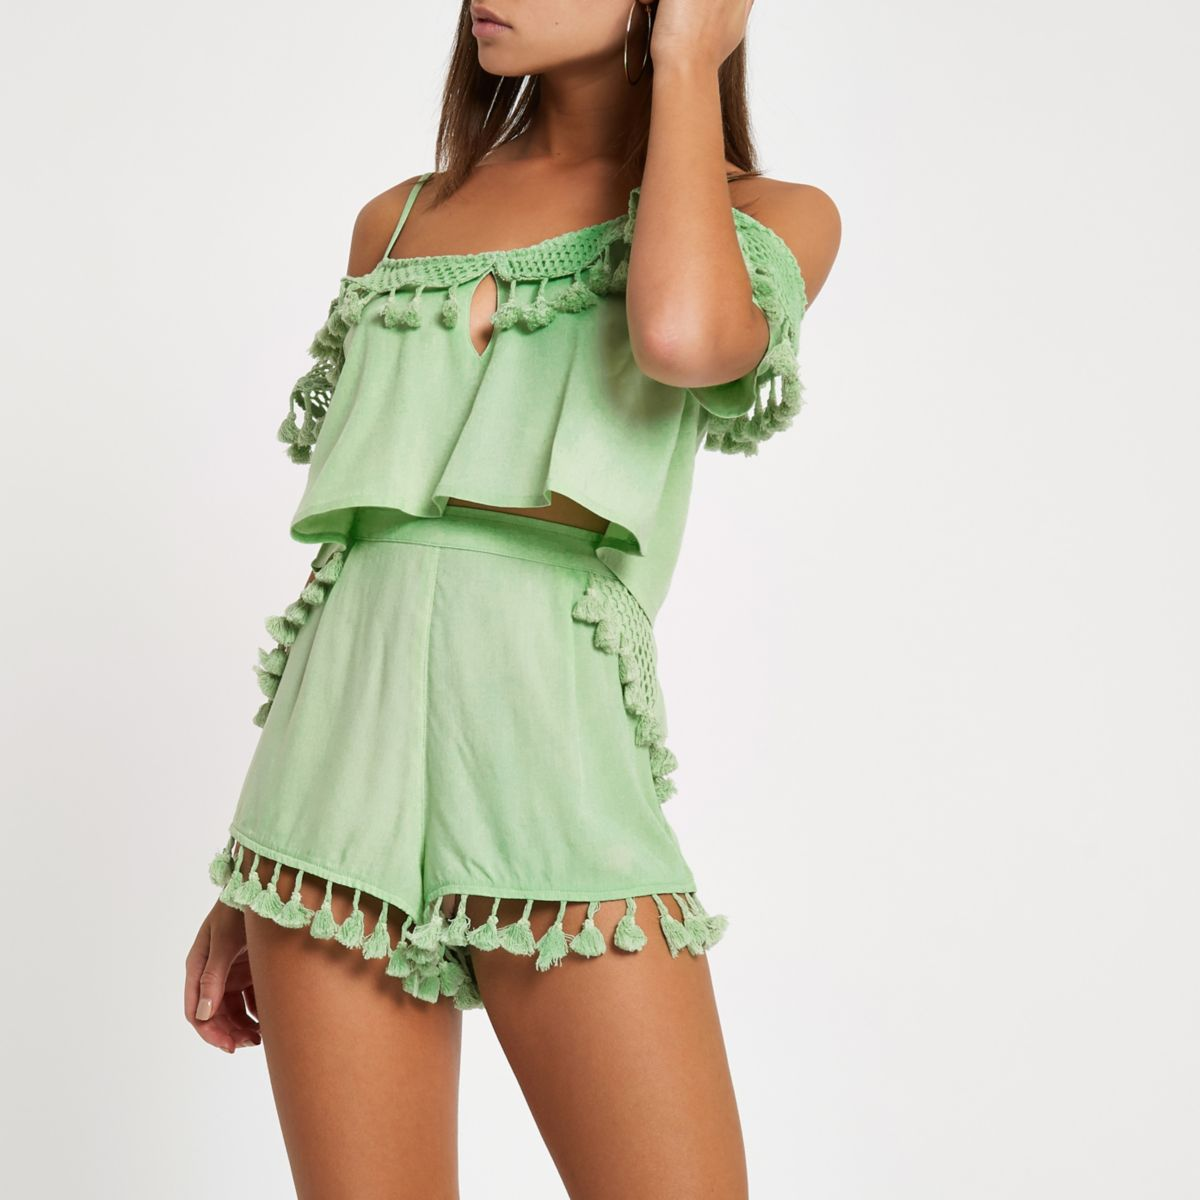 Green tassel trim beach shorts